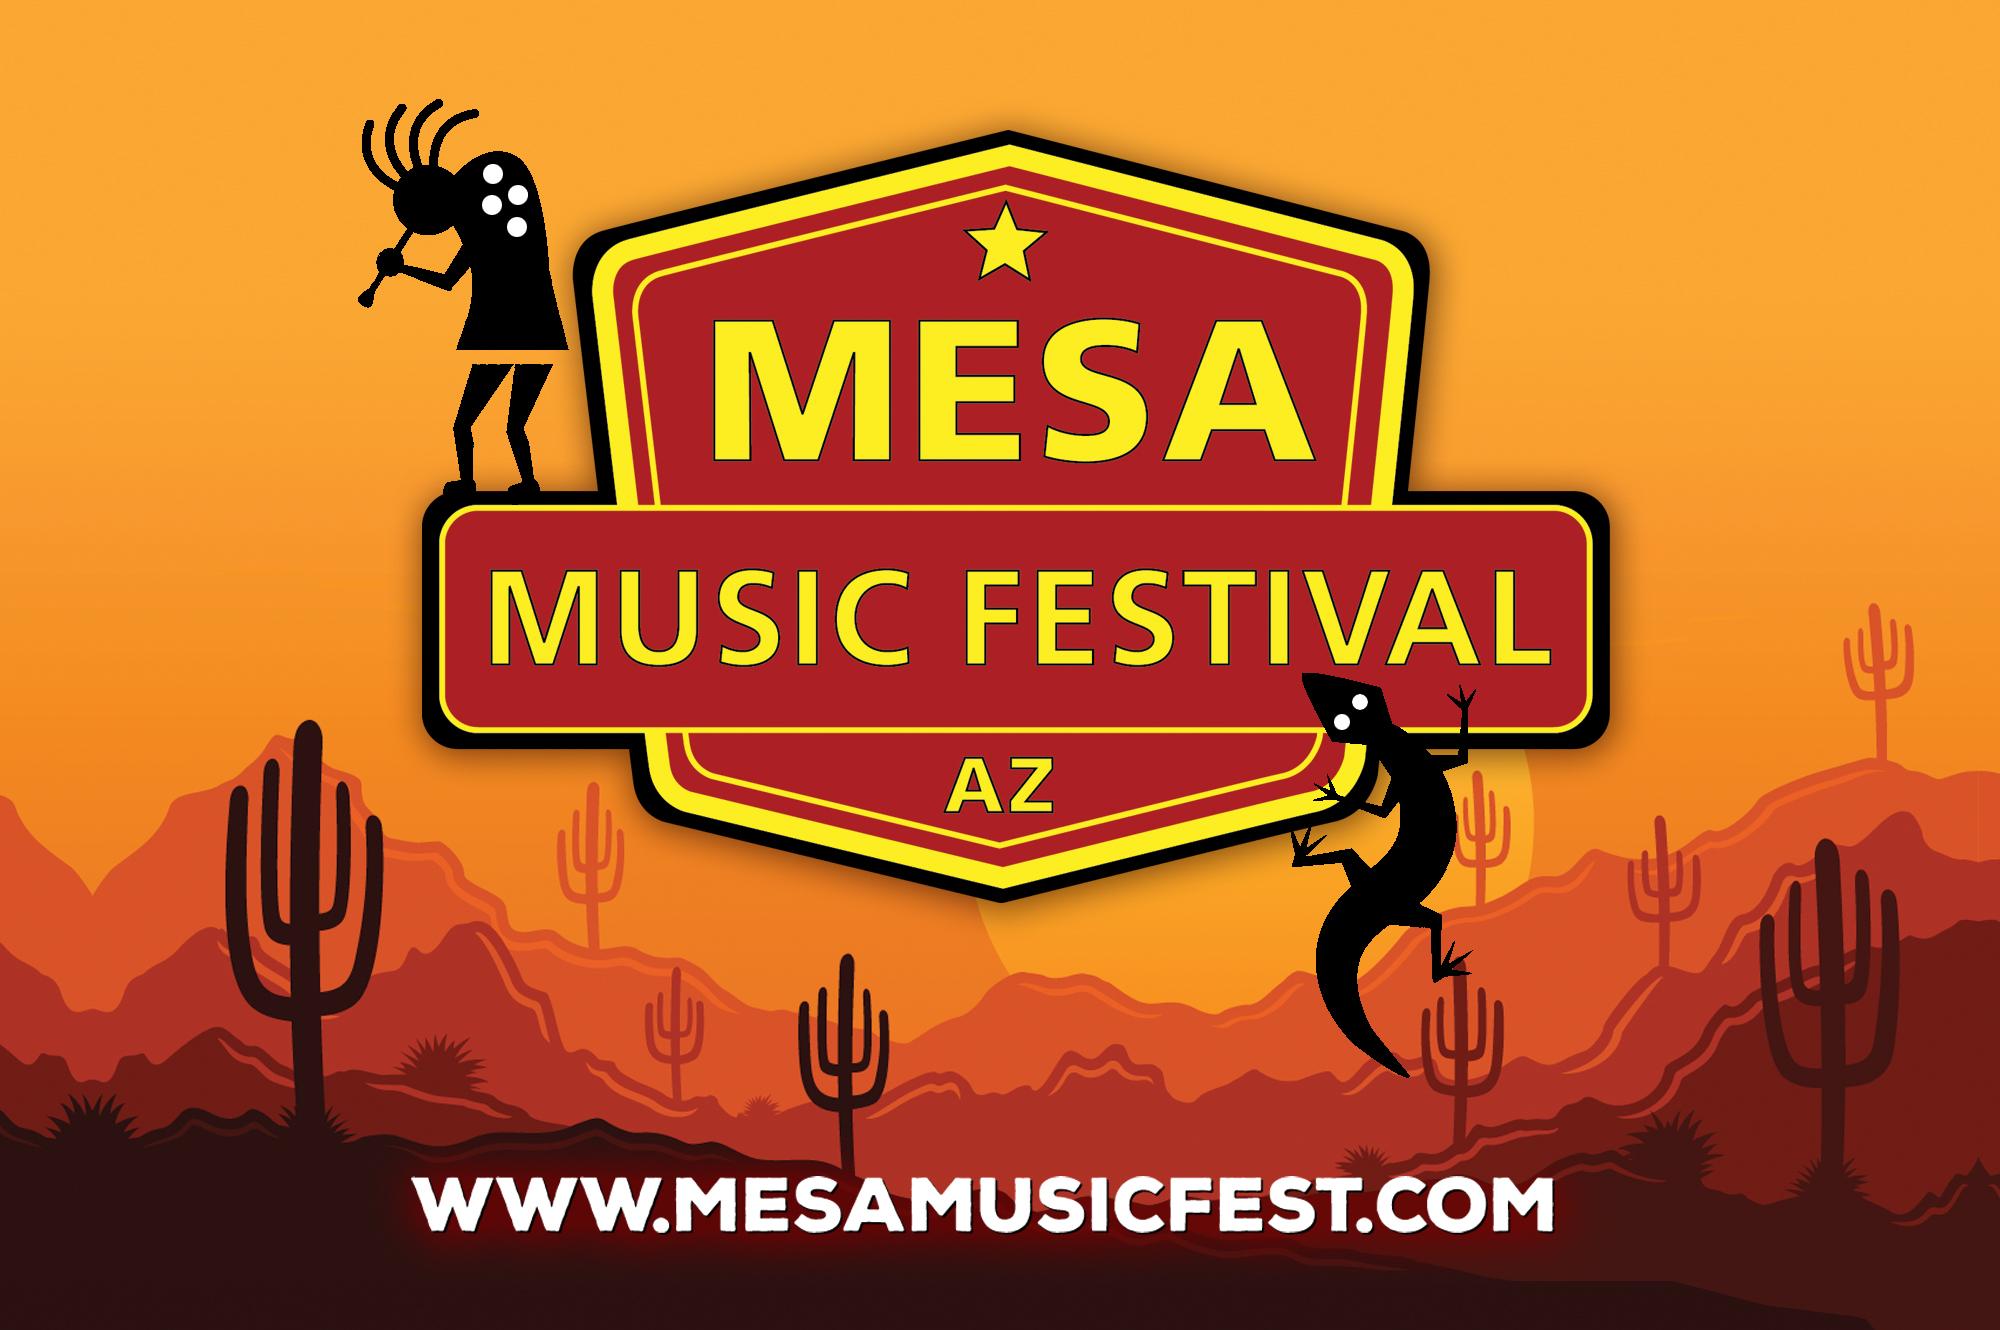 Mesa Music Festival